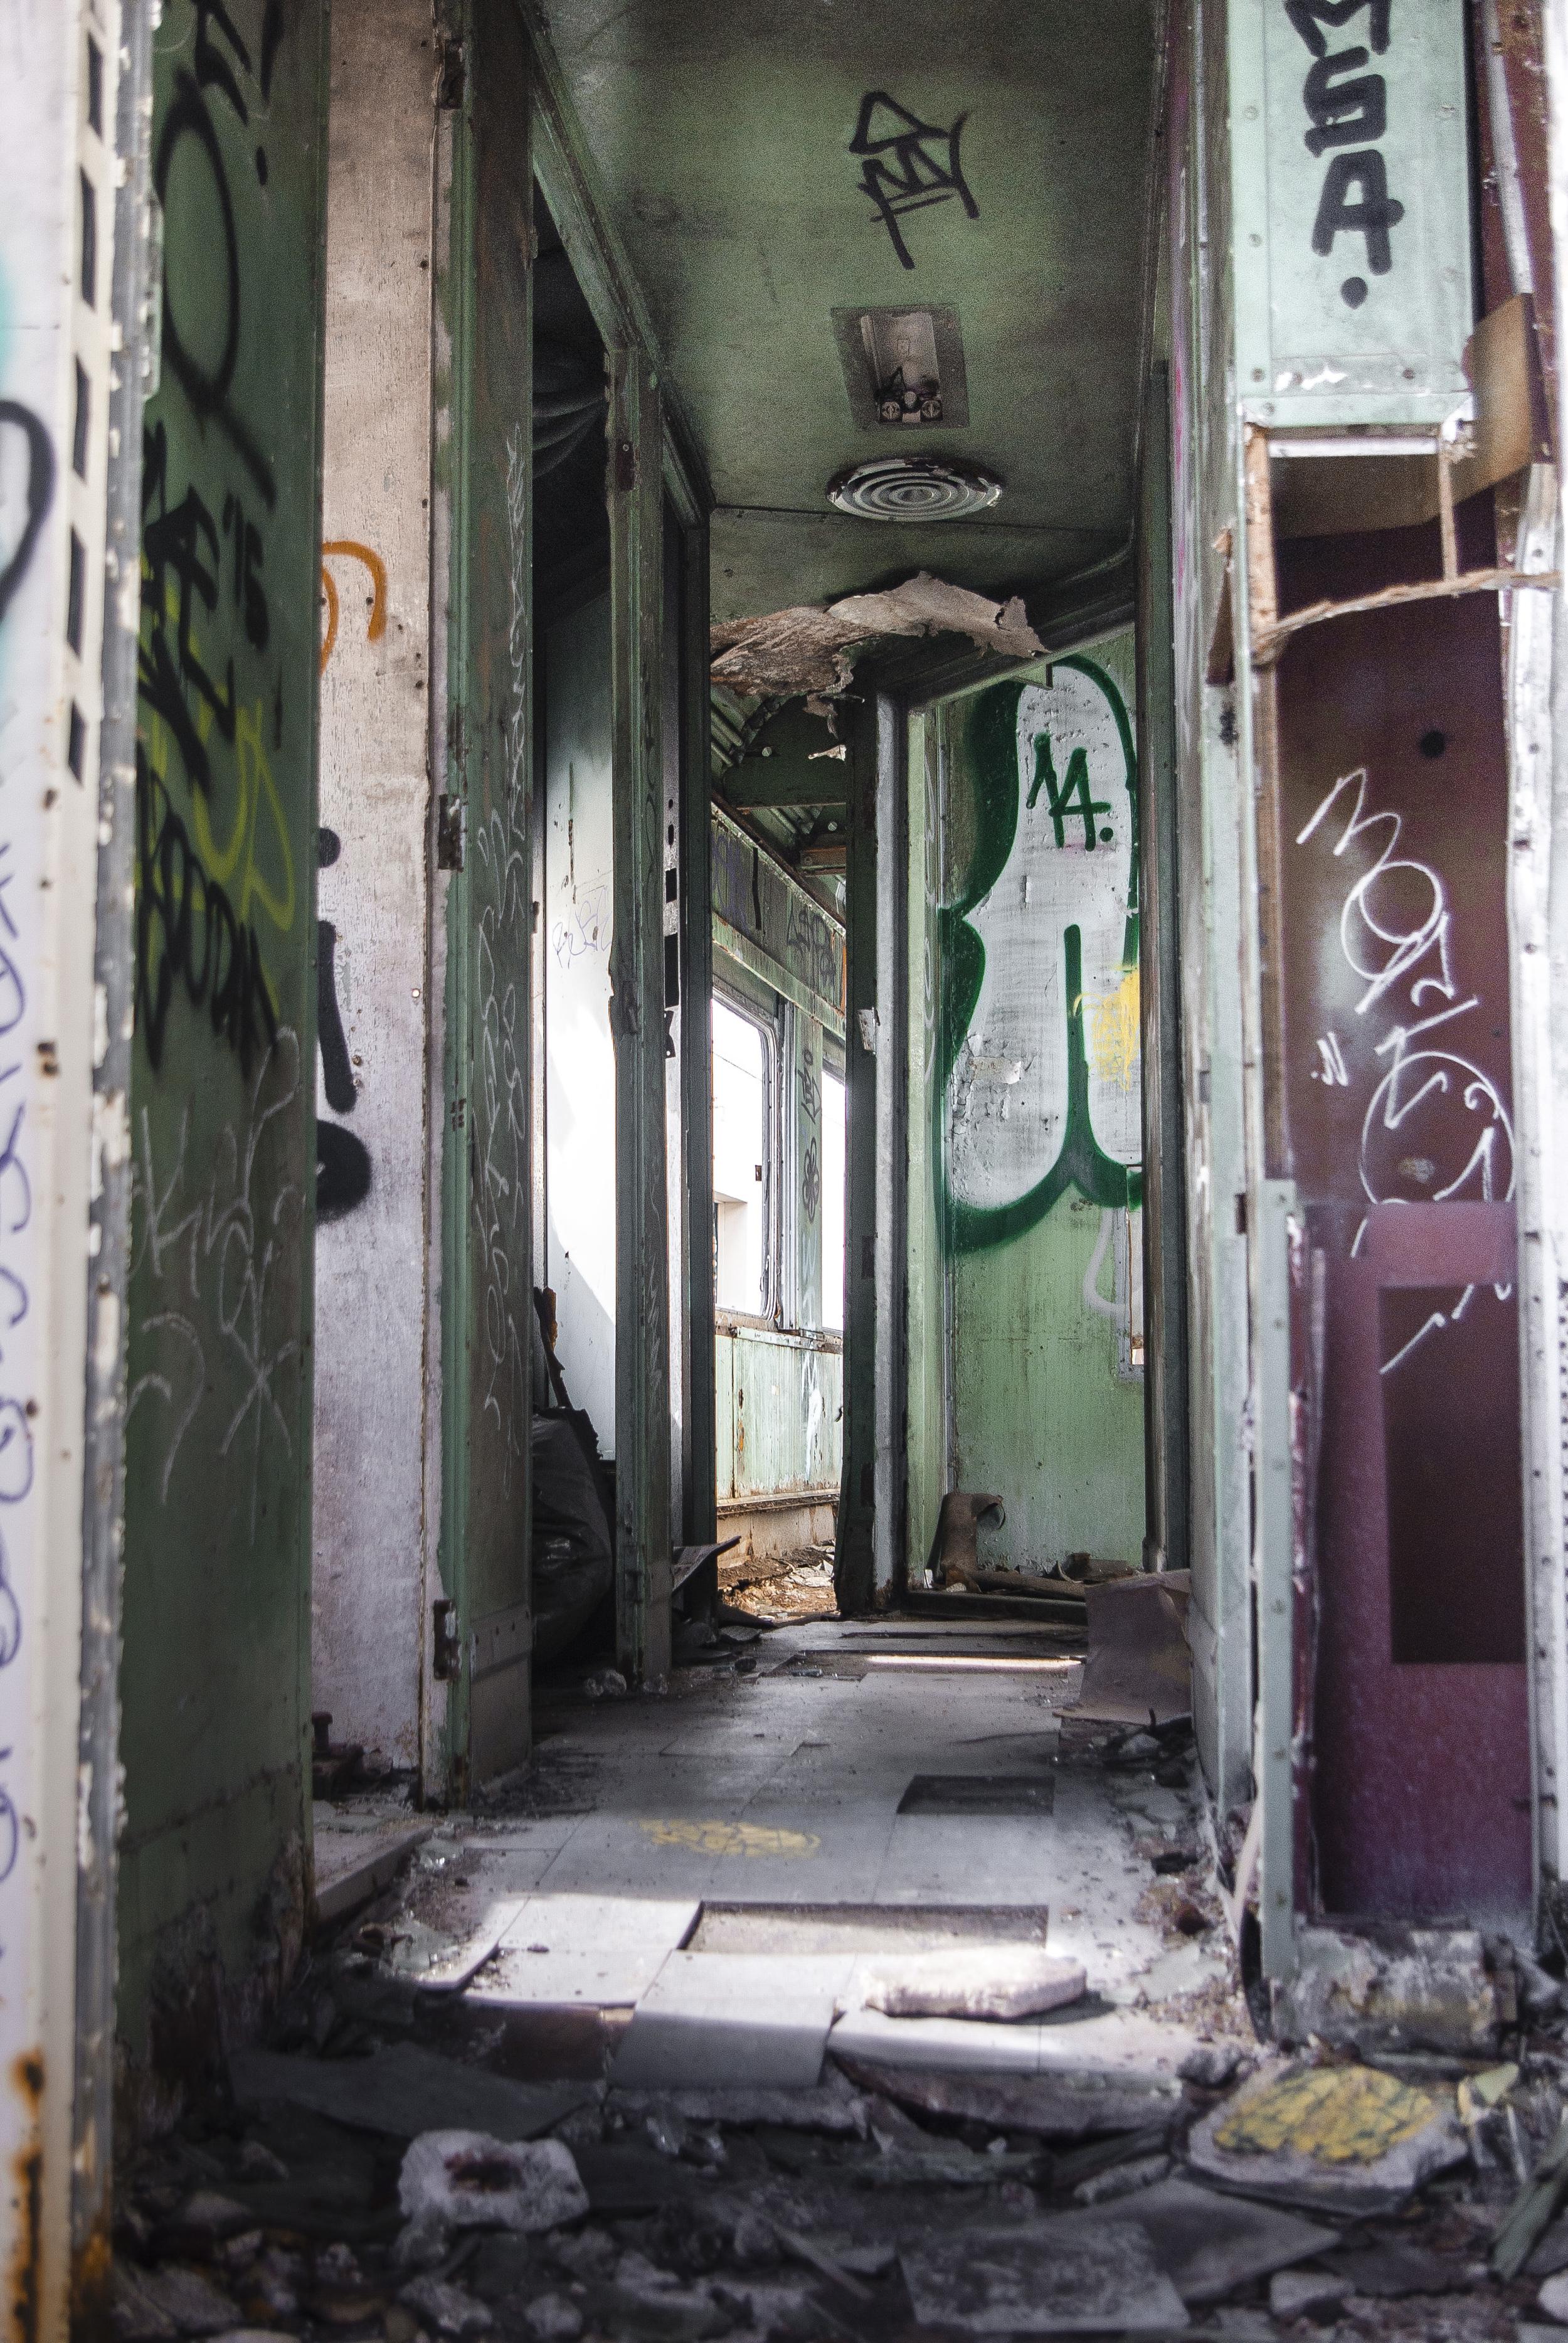 Abandoned Train Car 1 2016-1.jpg